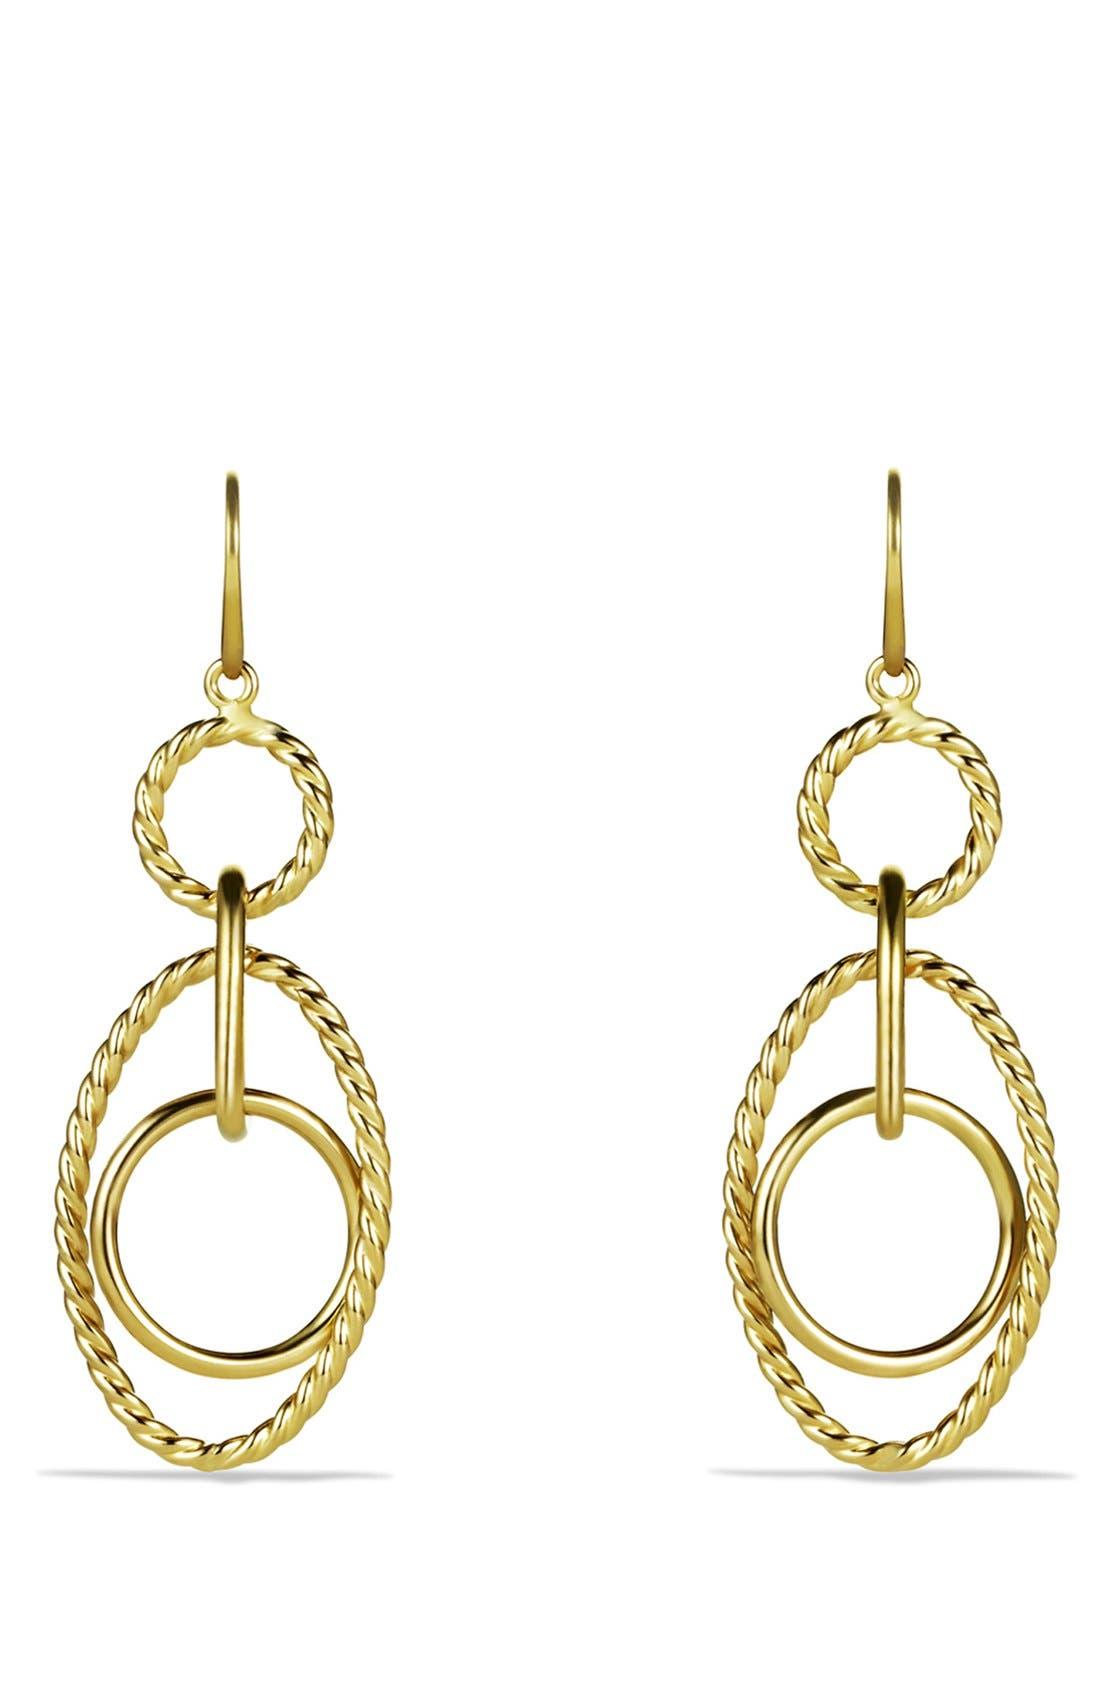 DAVID YURMAN Mobile Small Link Earrings in Gold